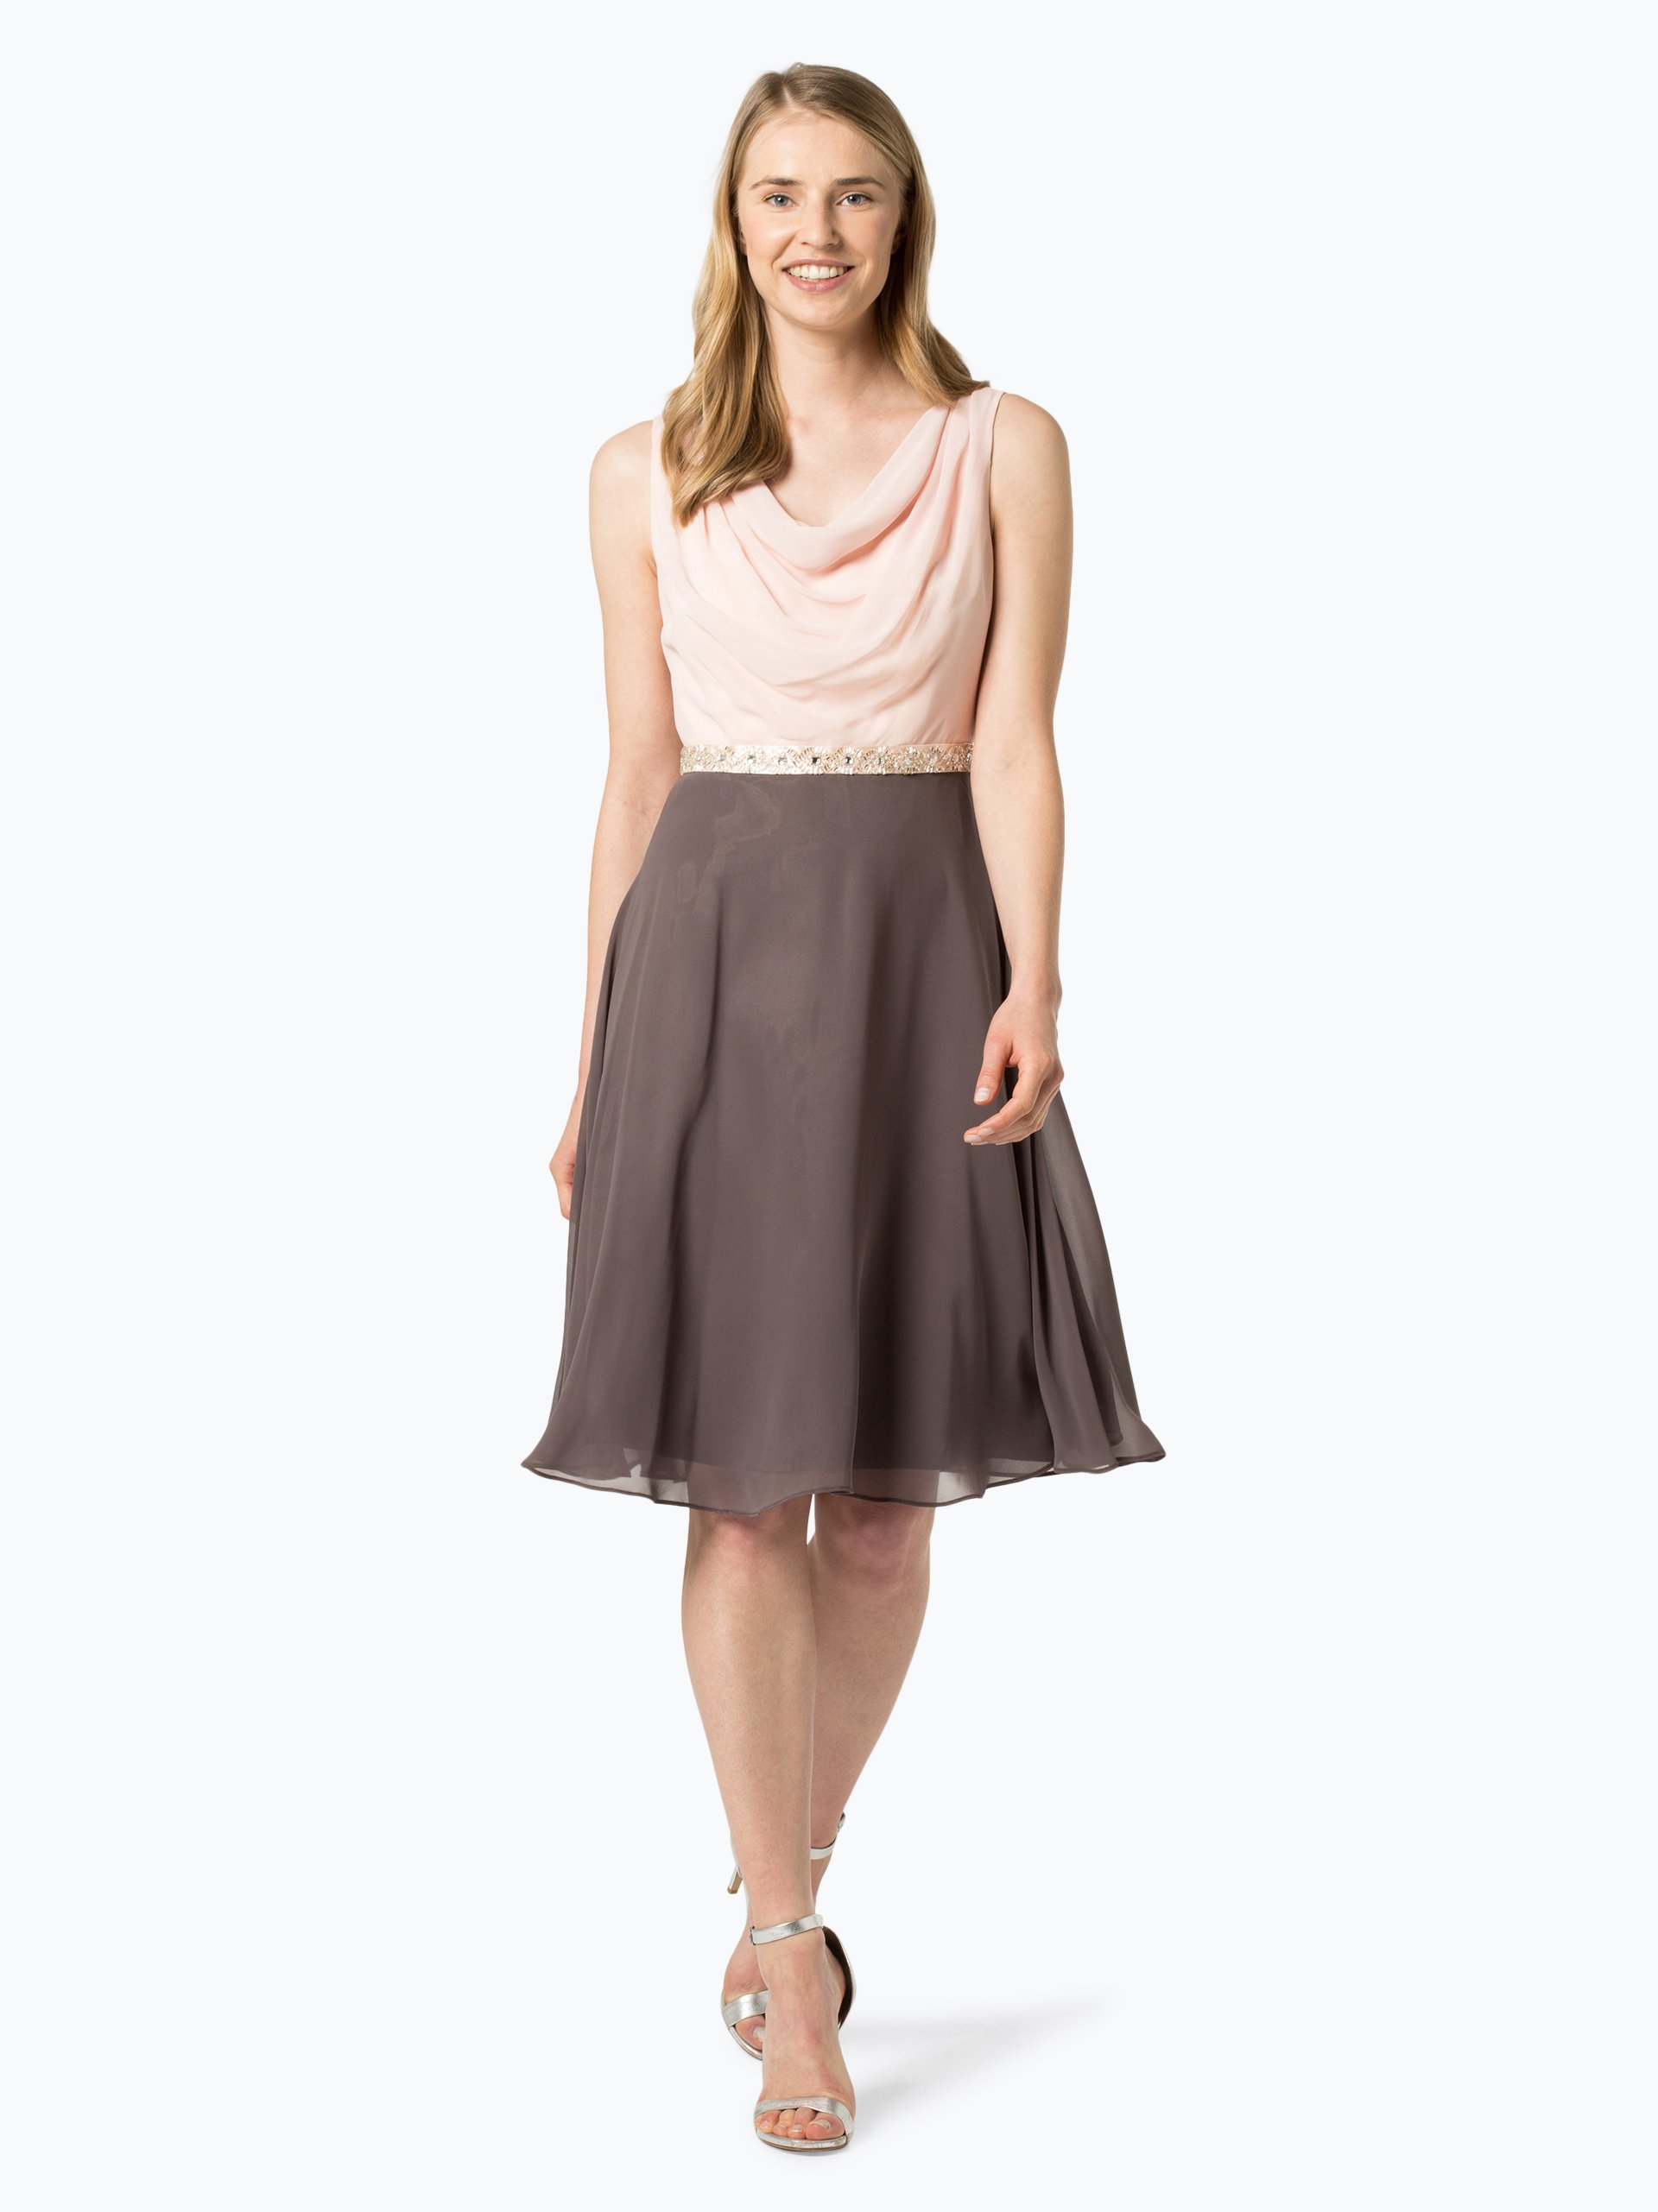 Apriori Damska sukienka koktajlowa